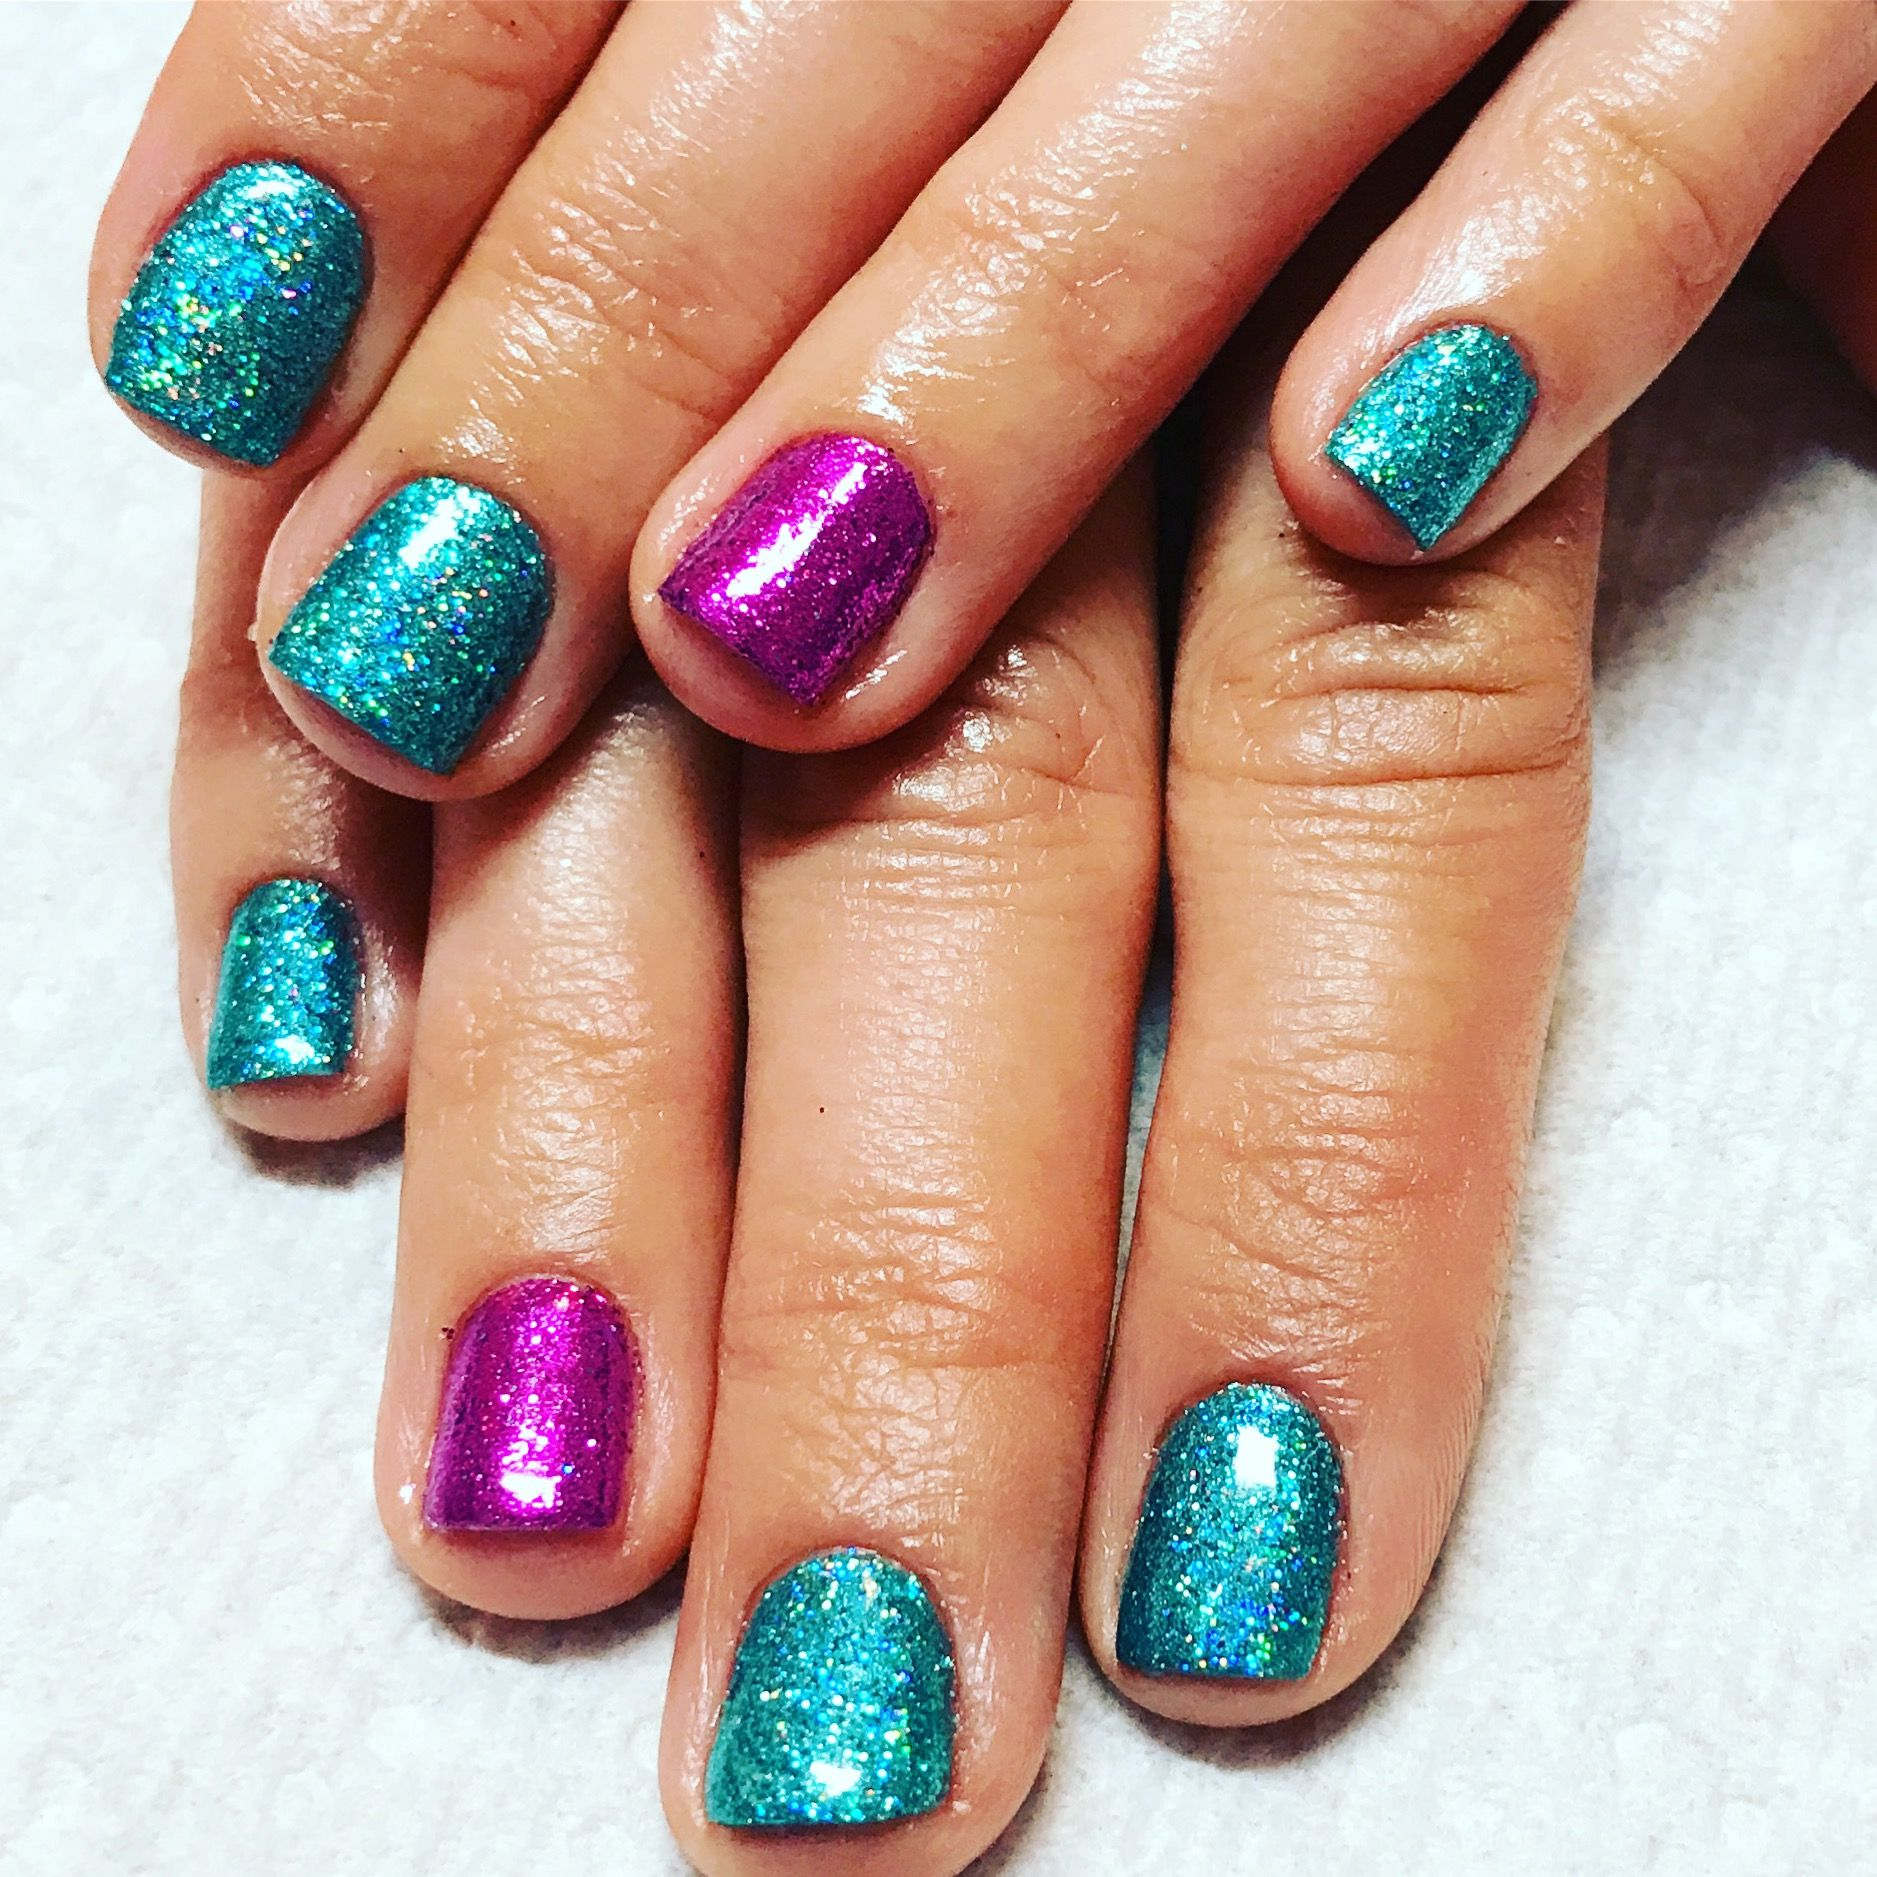 Mermaid Glitter Aqua Glitter Purple Glitter Rockstar Nails Glitter Nails Gel Nails Summer Nails Short Aqua Nails Glitter Gel Nails Nail Designs Glitter